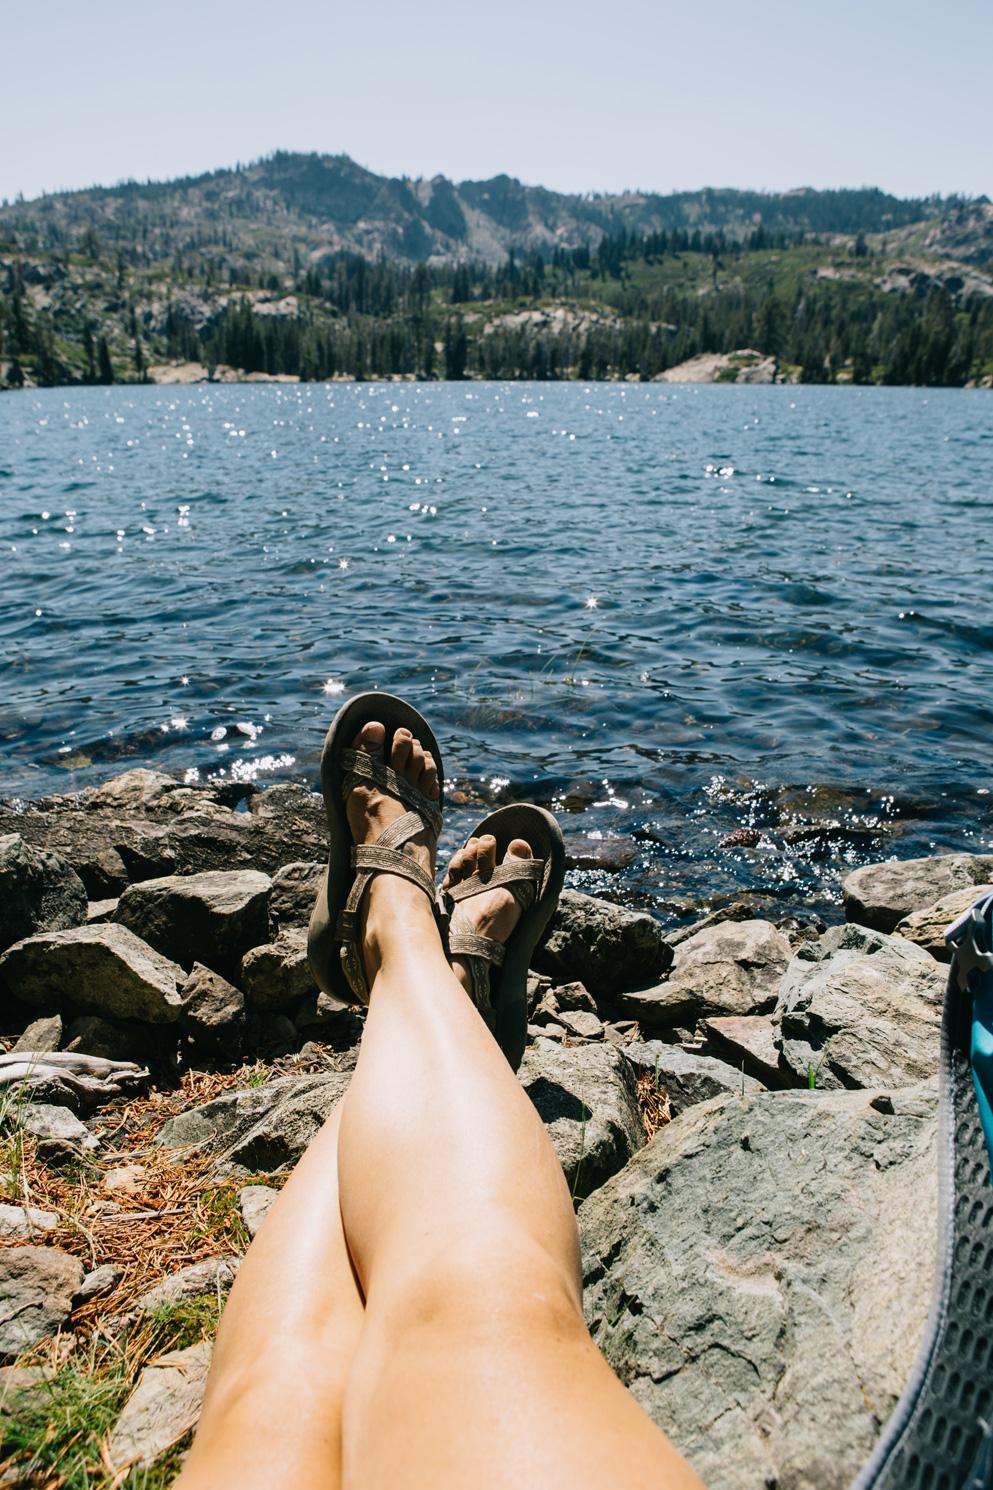 CindyGiovagnoli_outdoors_photographer_Sierra_Buttes_firetower_watchtower_Sardine_Snag_Bear_lake_hike_swim_camp-056.jpg